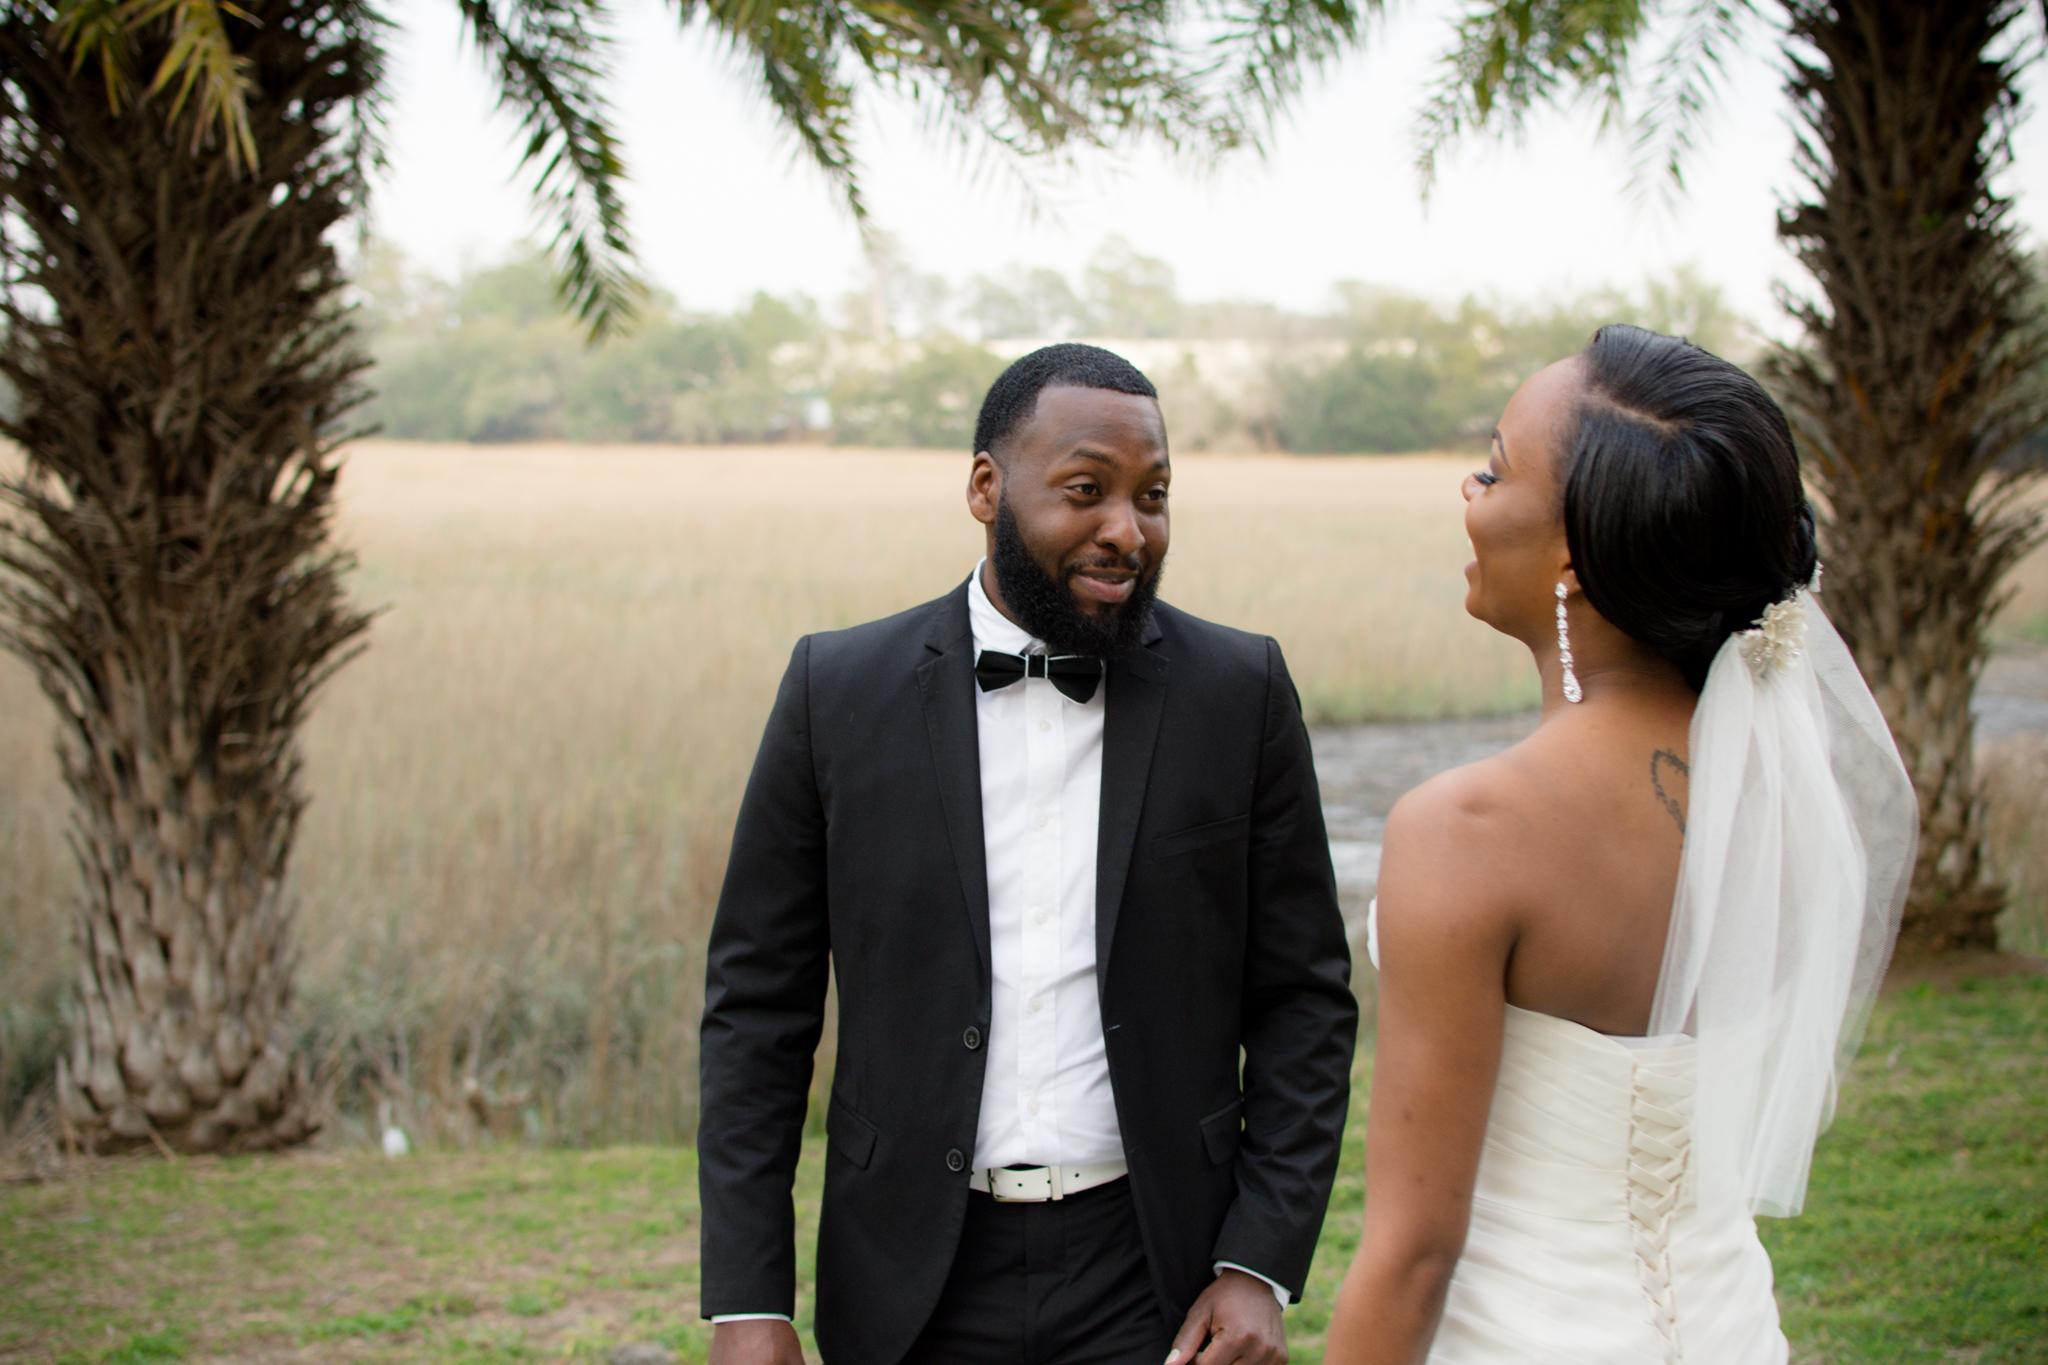 chaplin wedding (49 of 181).JPG